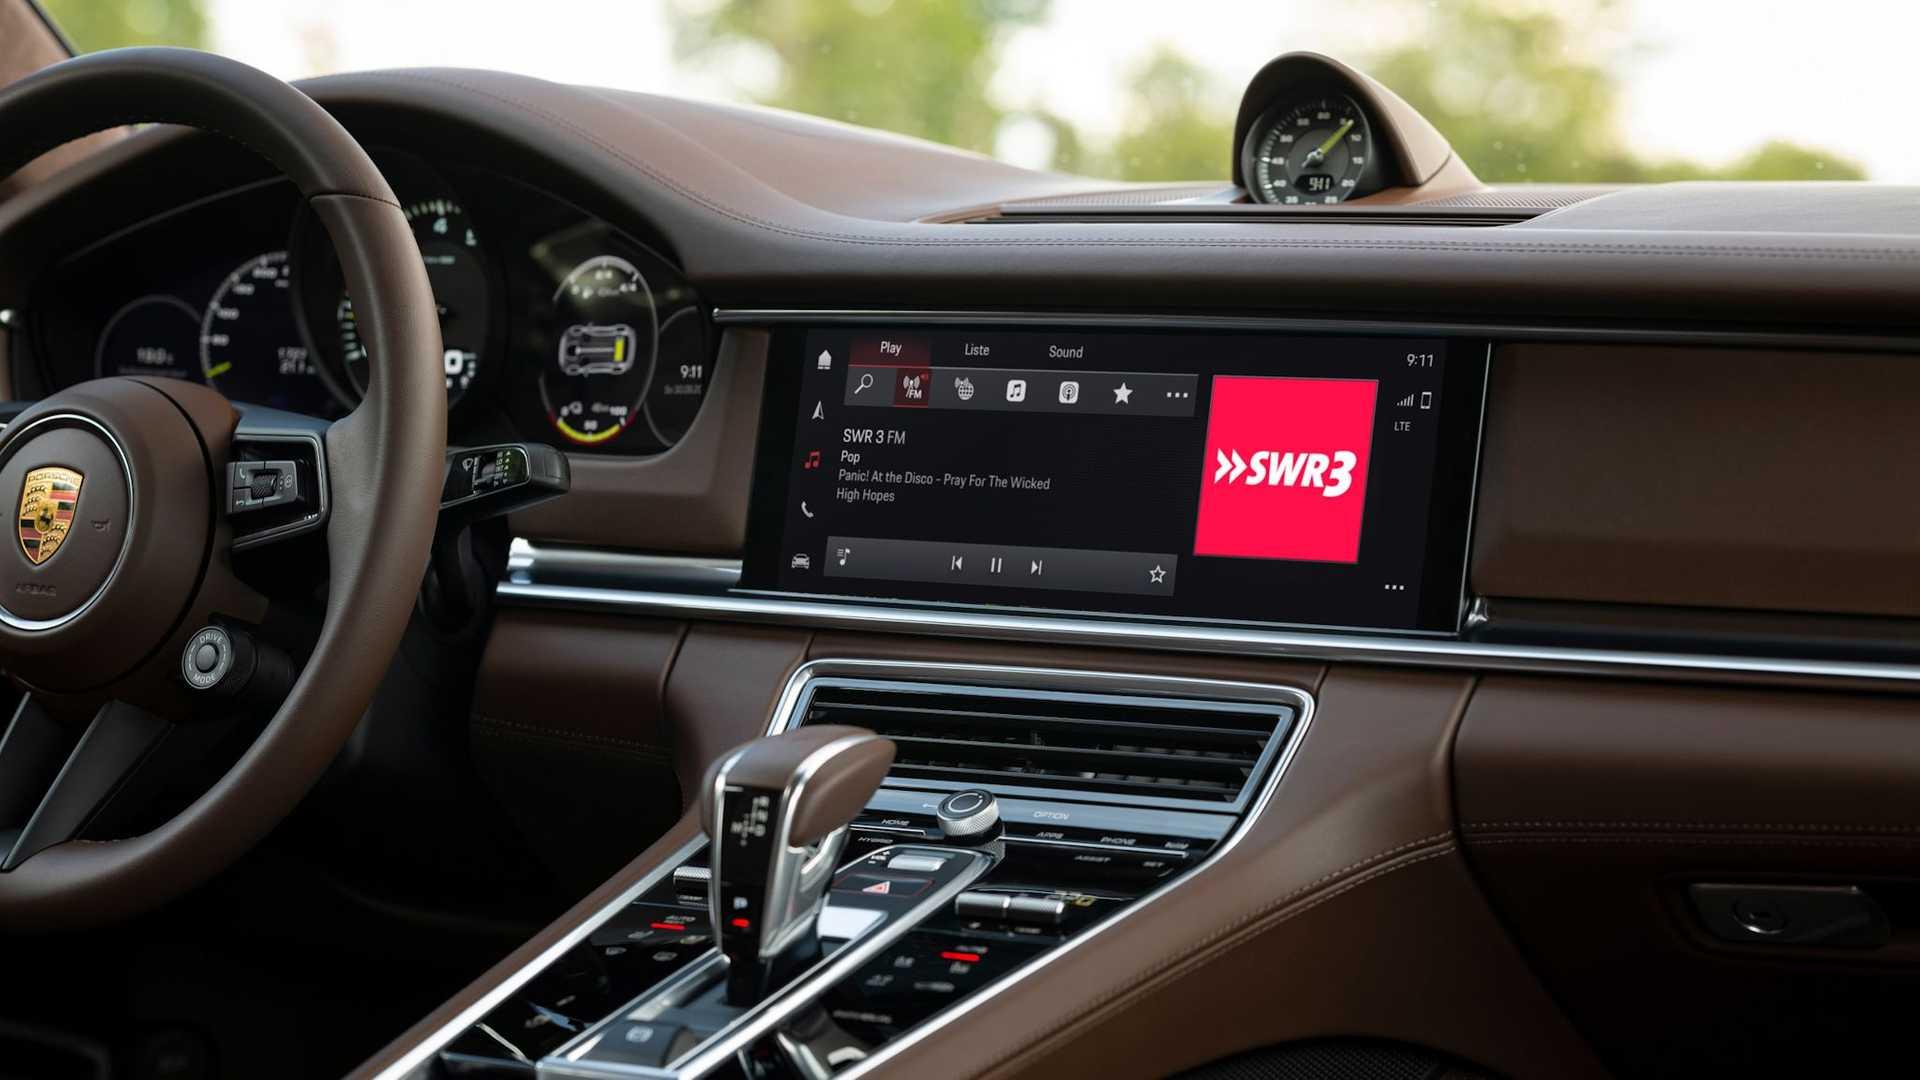 Porsche-Communication-Management-6-30